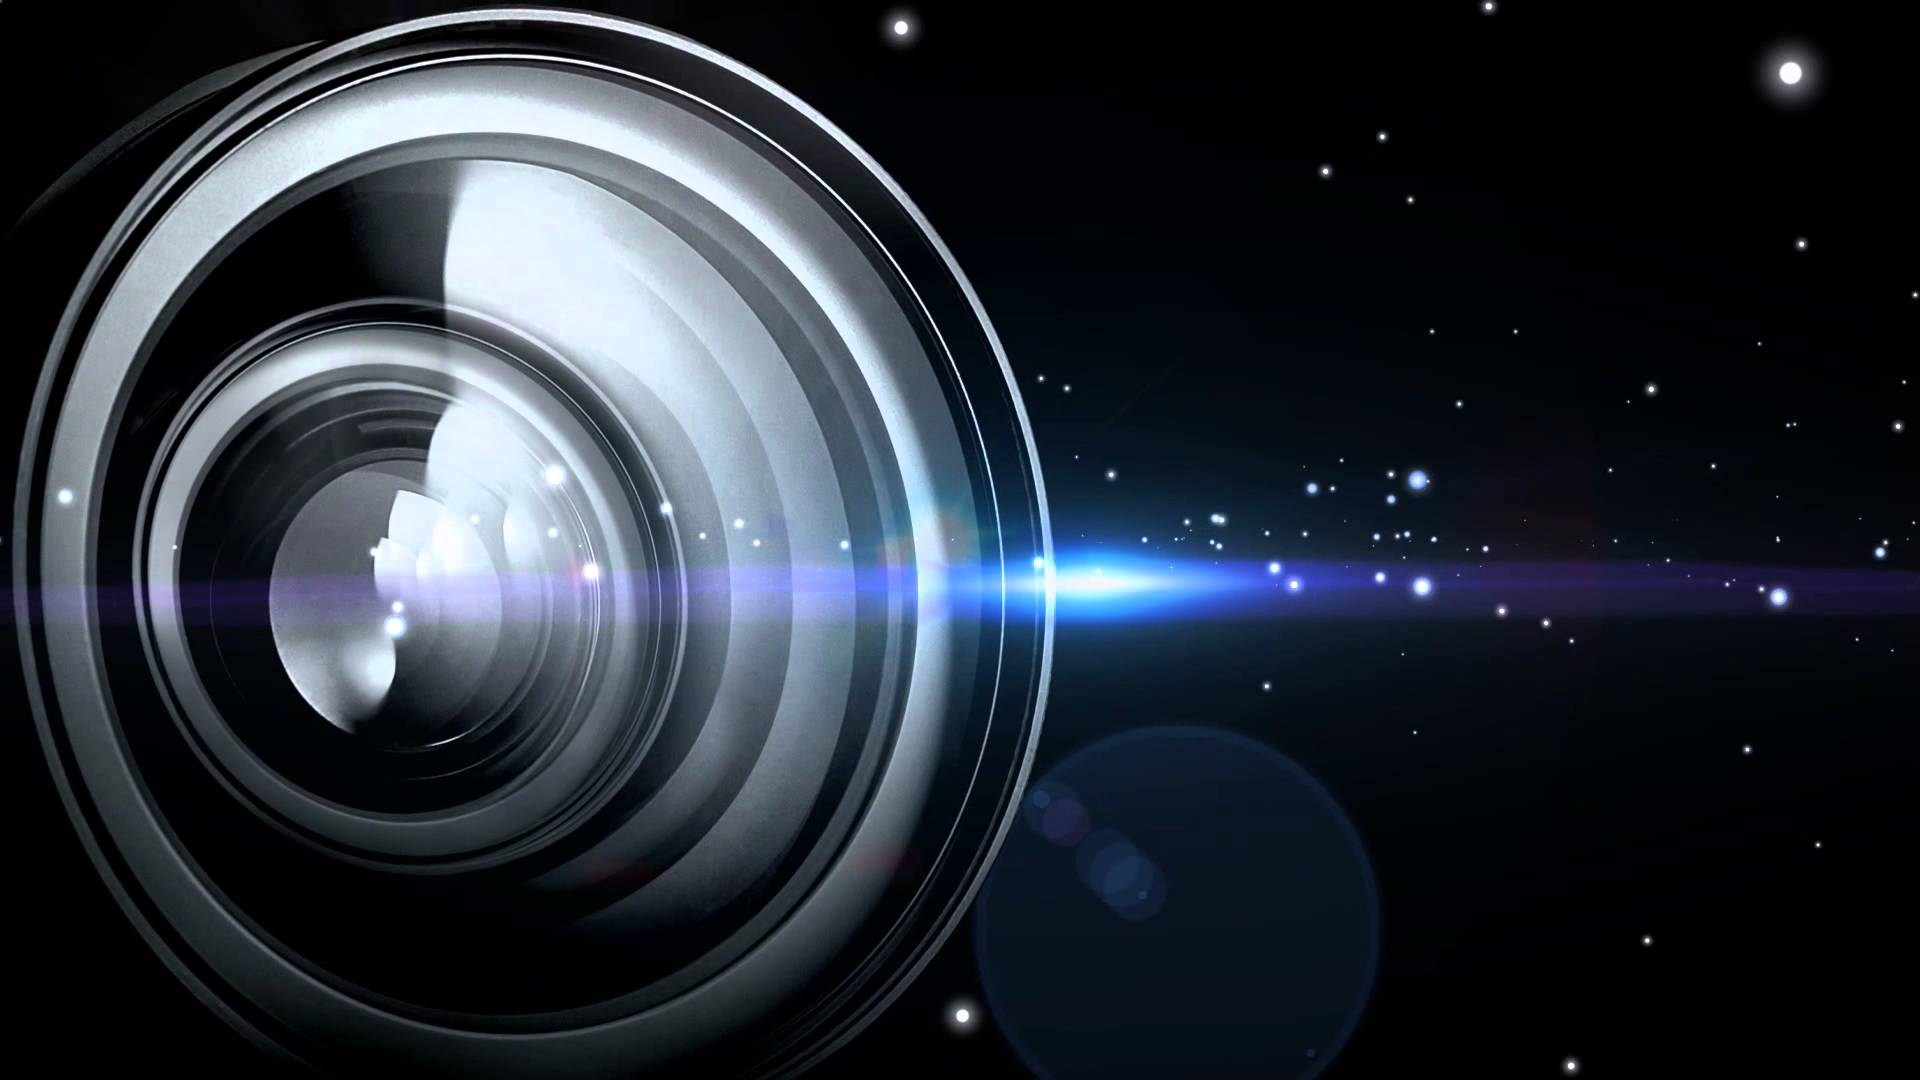 PowerDirector-Video-Editing-Software-Intro-CyberLink-wallpaper-wpc9008627